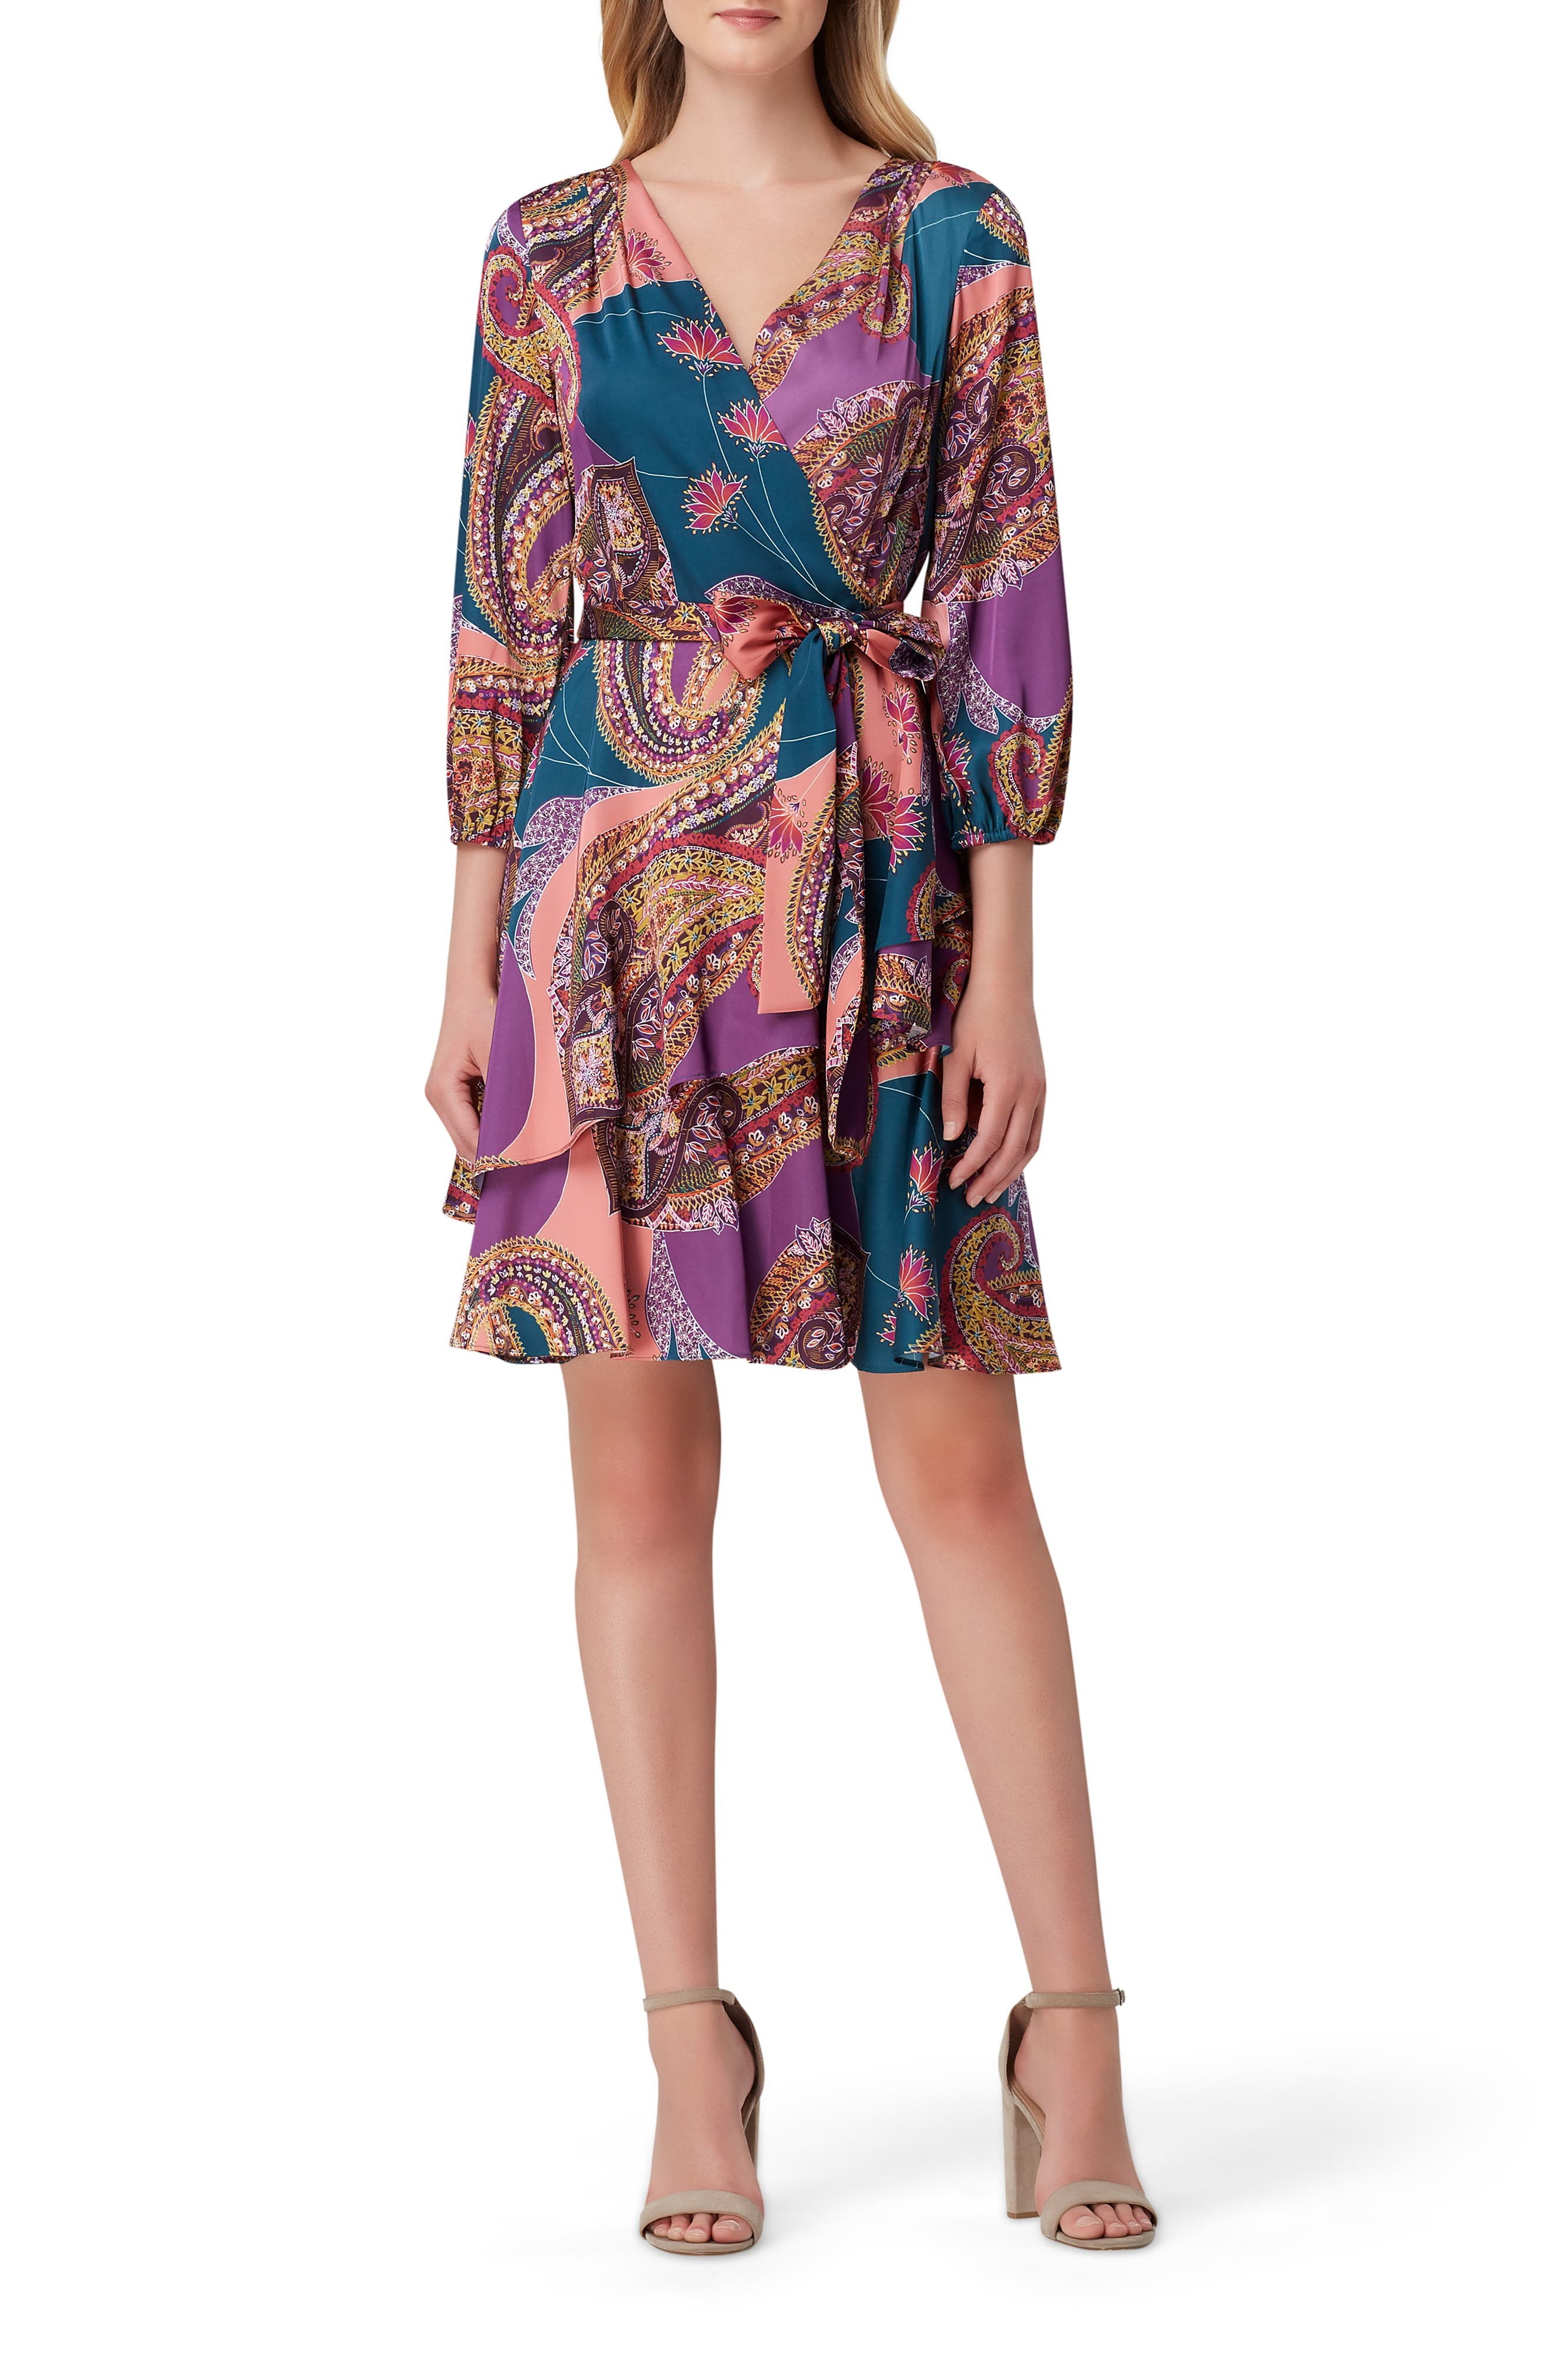 Tahari Dresses Paisley Print Faux Wrap Satin Georgette Dress